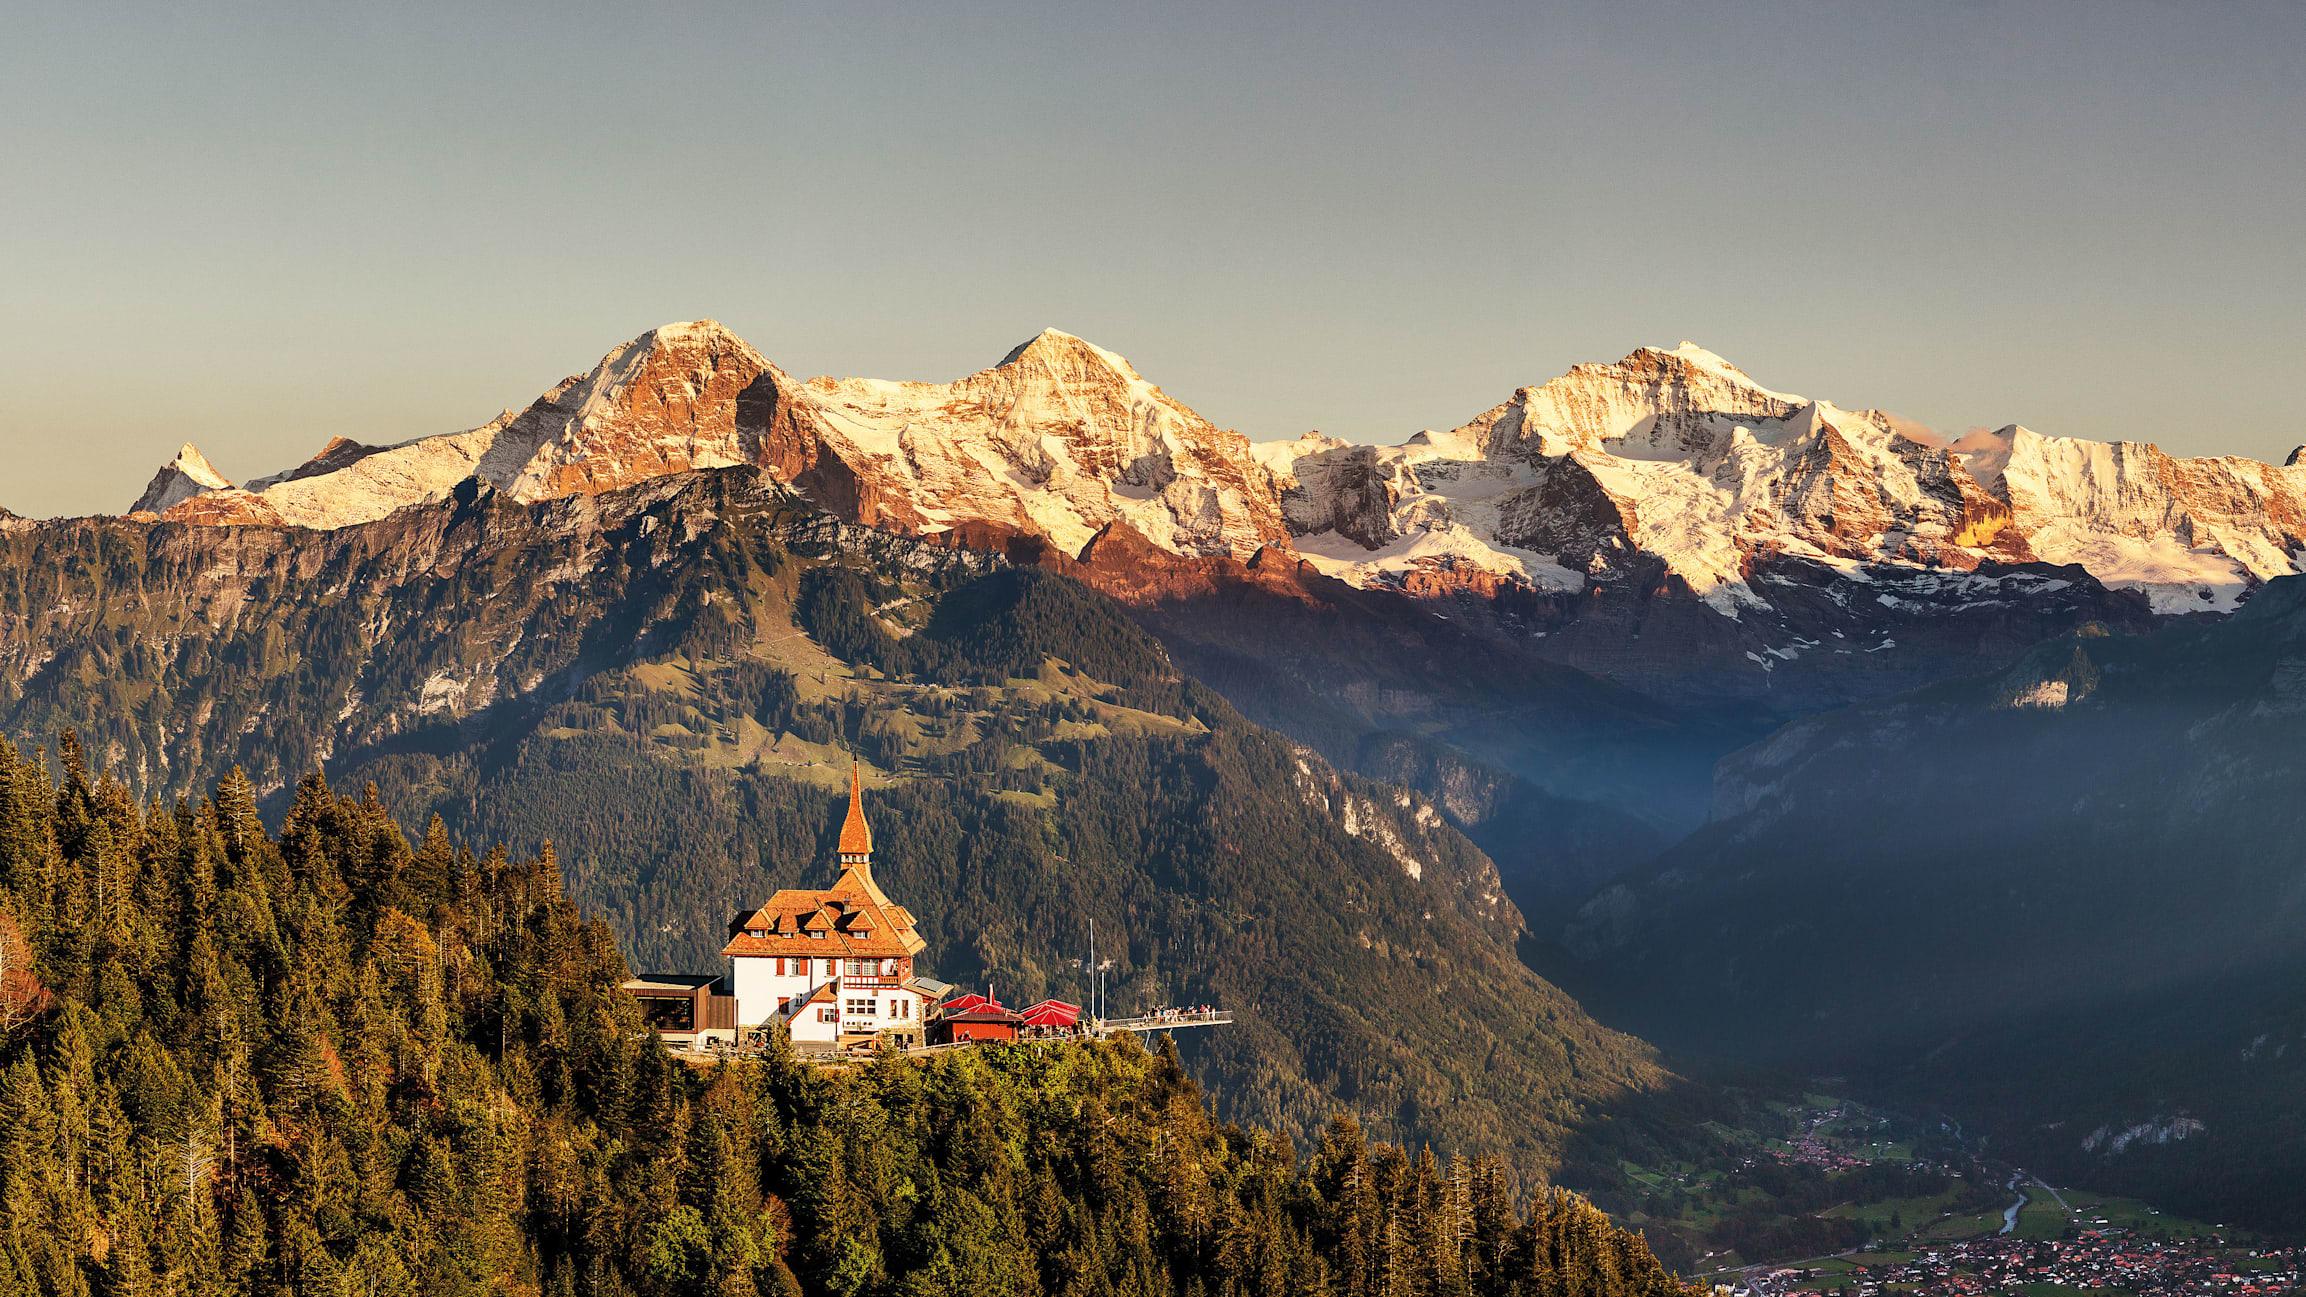 Harder Kulm Panorama Eiger Moench Jungfrau Sunset